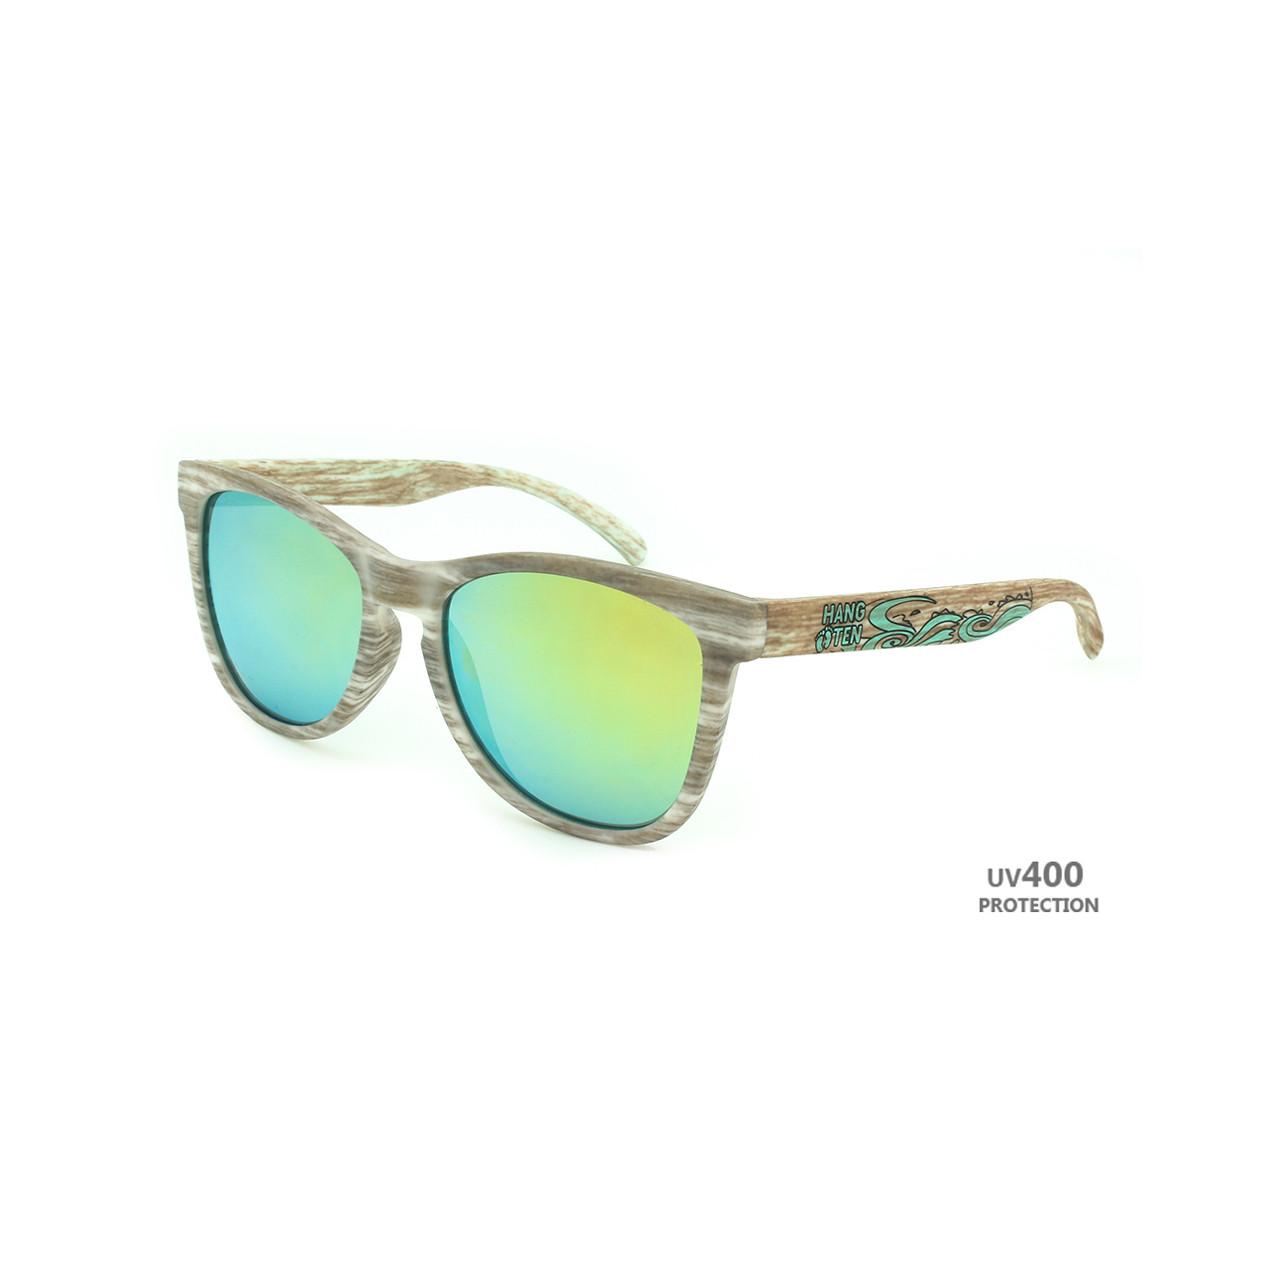 8c59e7ad528 Hangten Kids Sunglasses Dark Grey Wood Grain Frame Yellow Colored Mirror  Lens Brown Wood Look Temple